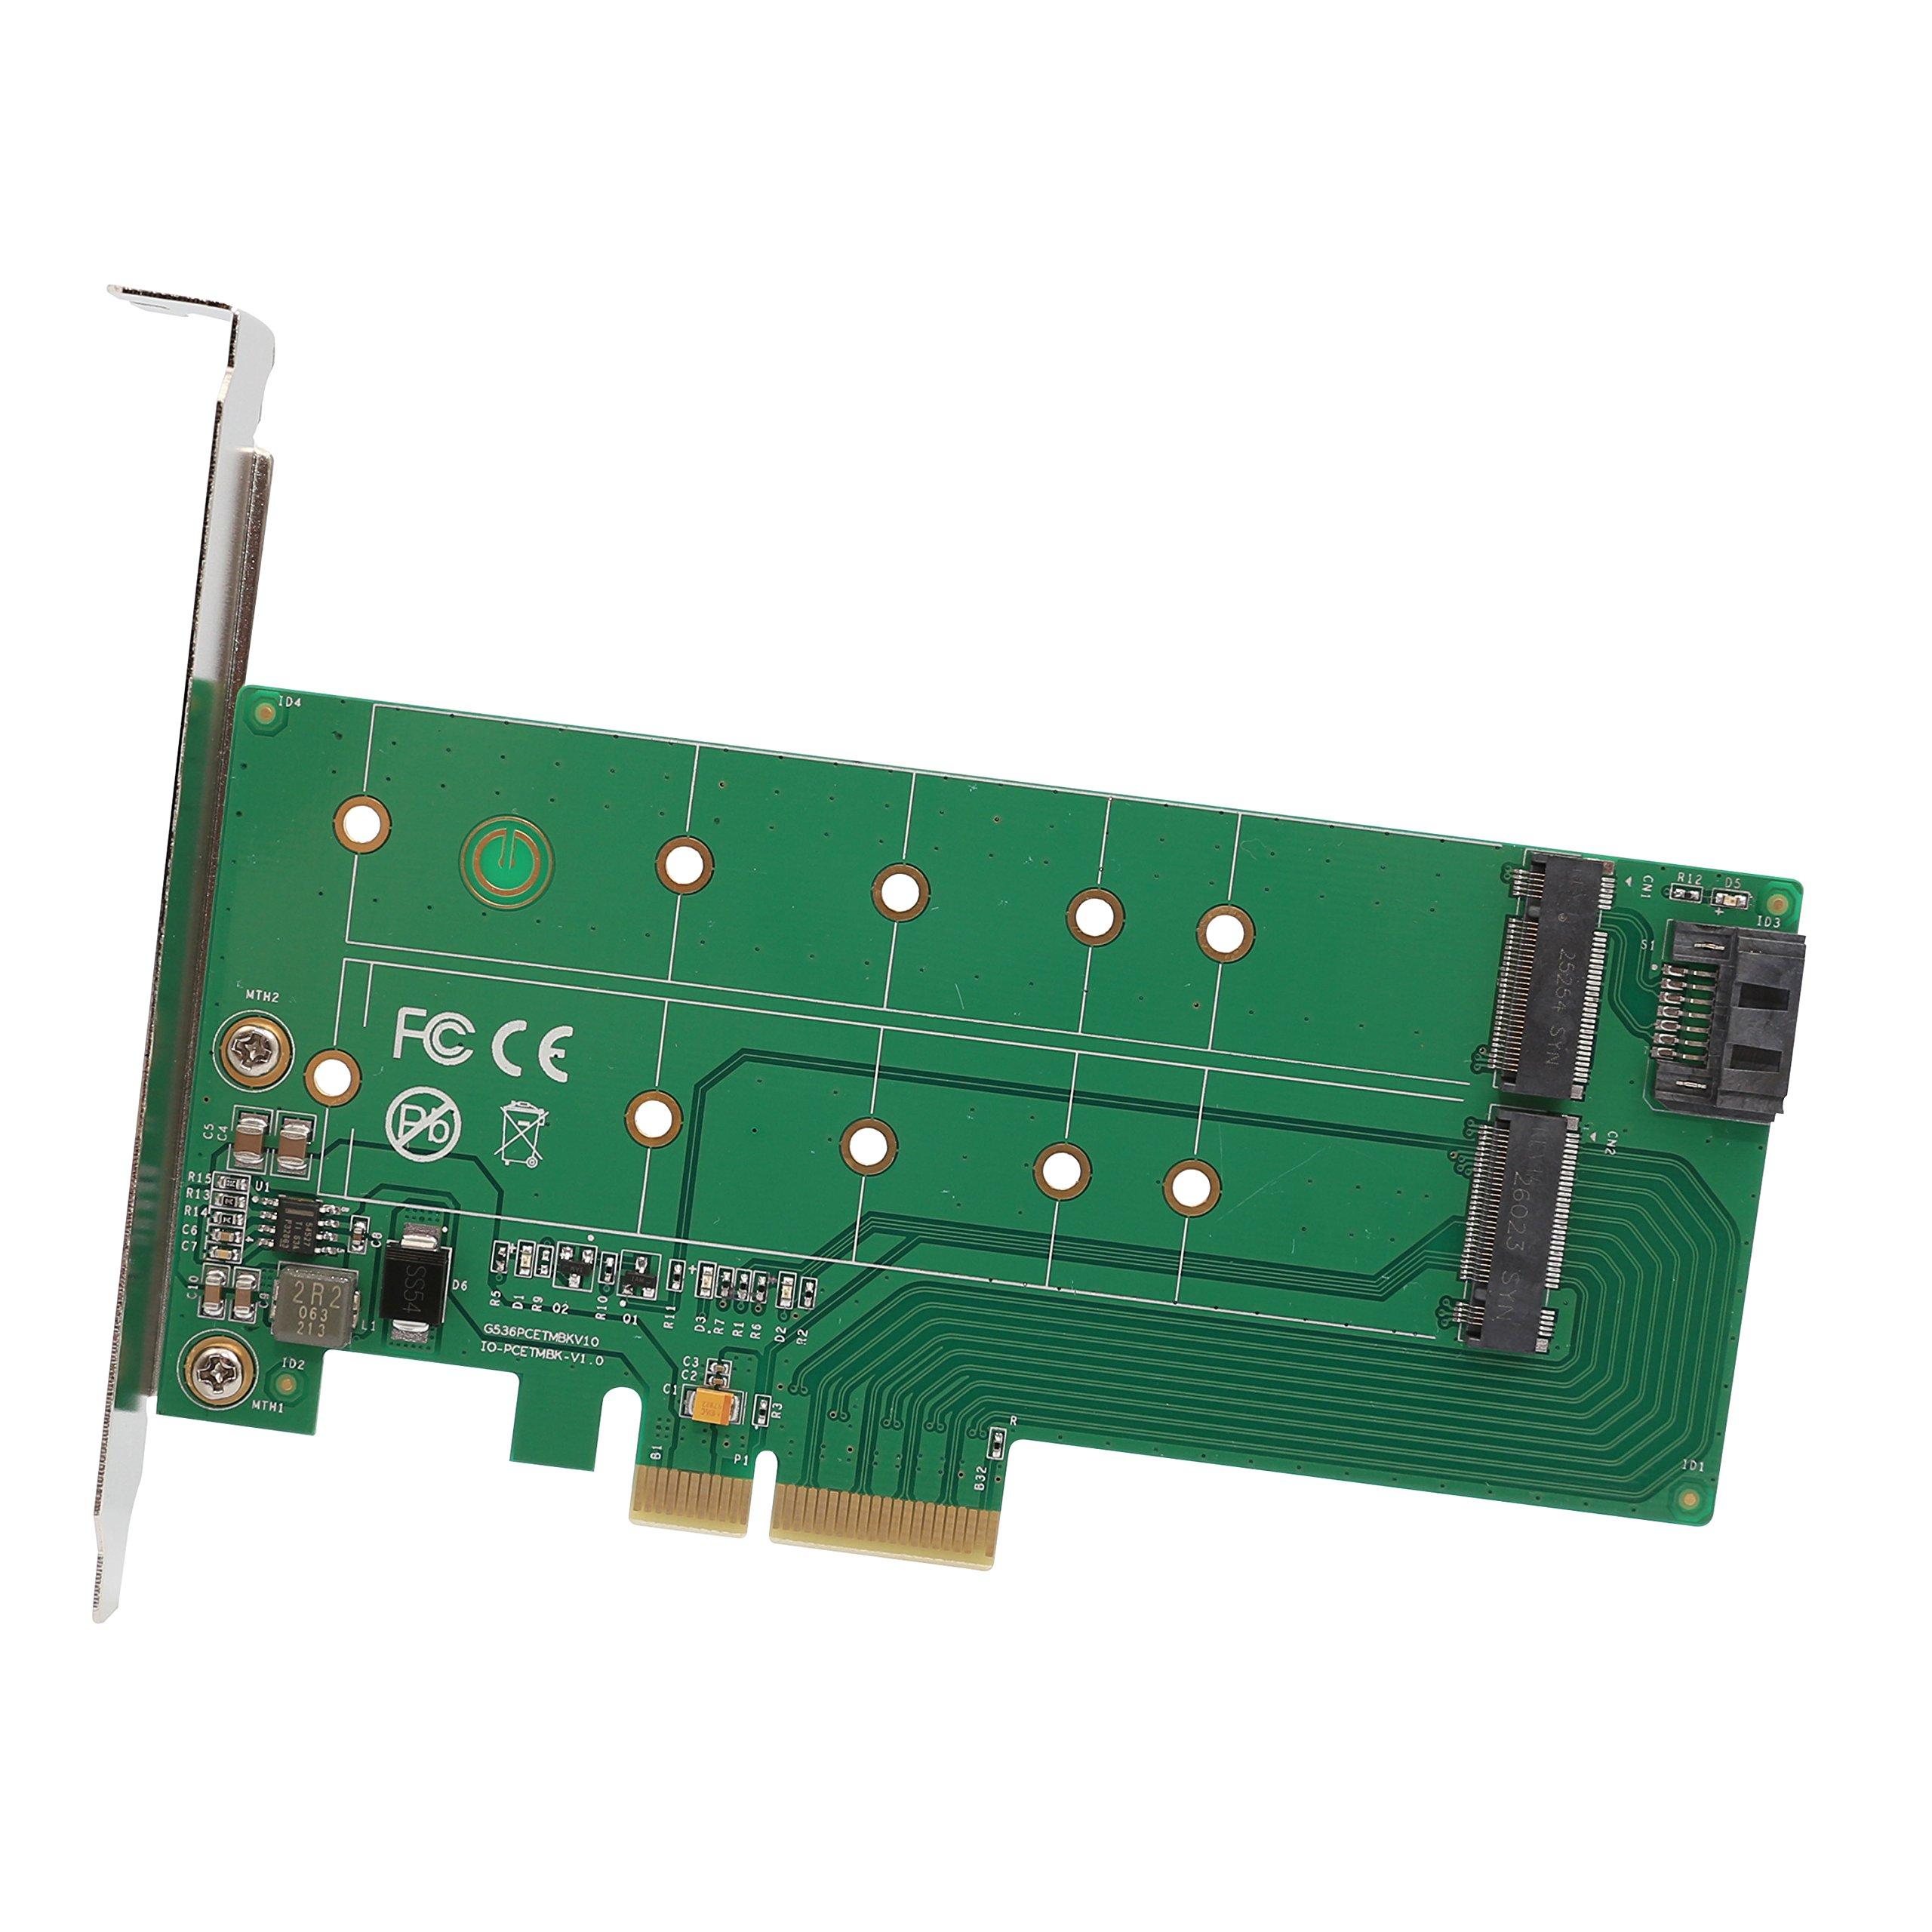 PCI-Express 2.0 x4, 1x M.2 M-Key 1x M.2 B-Key Card(SI-PEX40122)